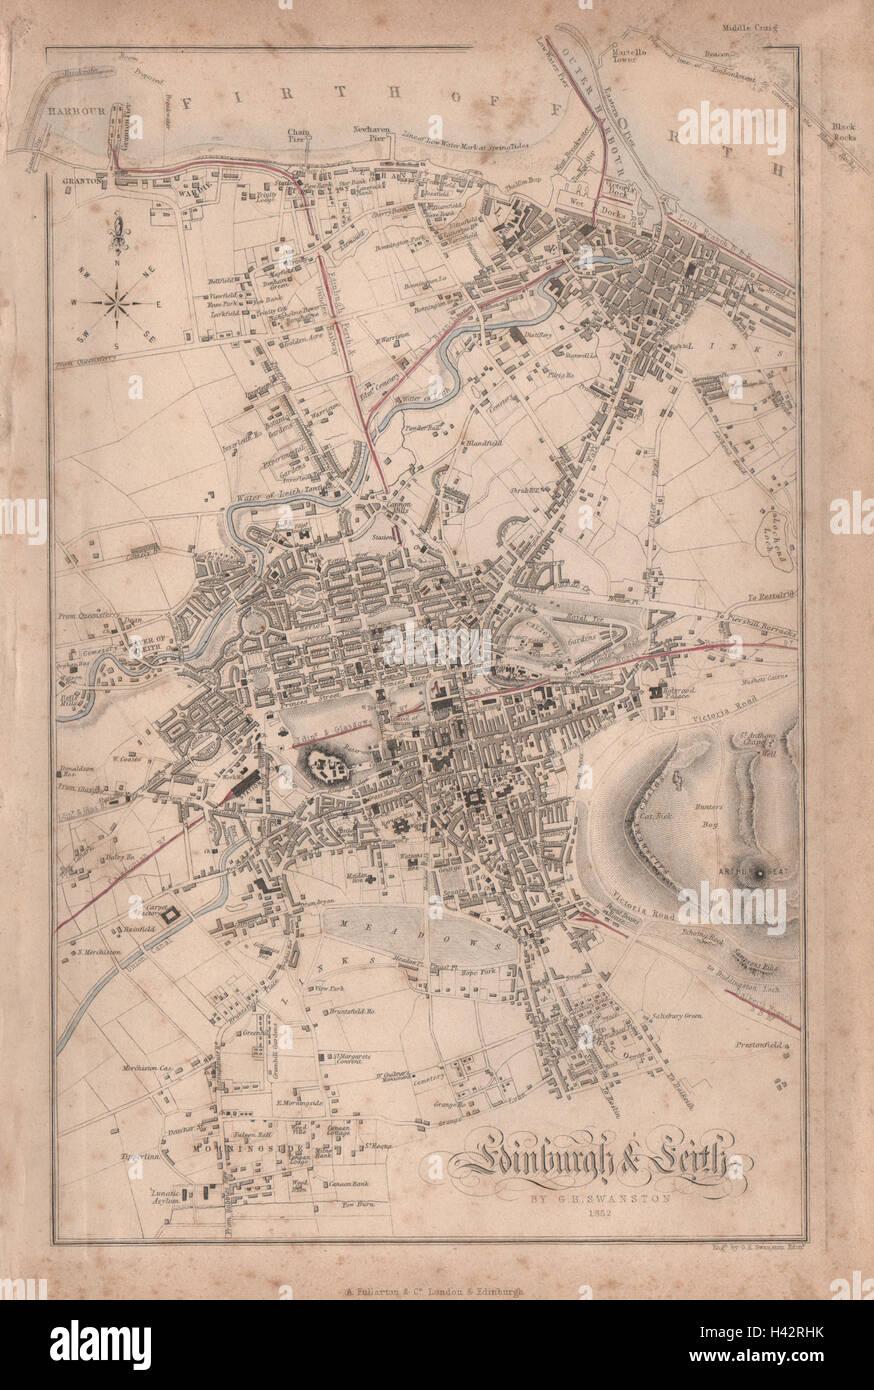 Leith Scotland Map.Edinburgh Leith Antique Town City Plan Scotland Swanston 1868